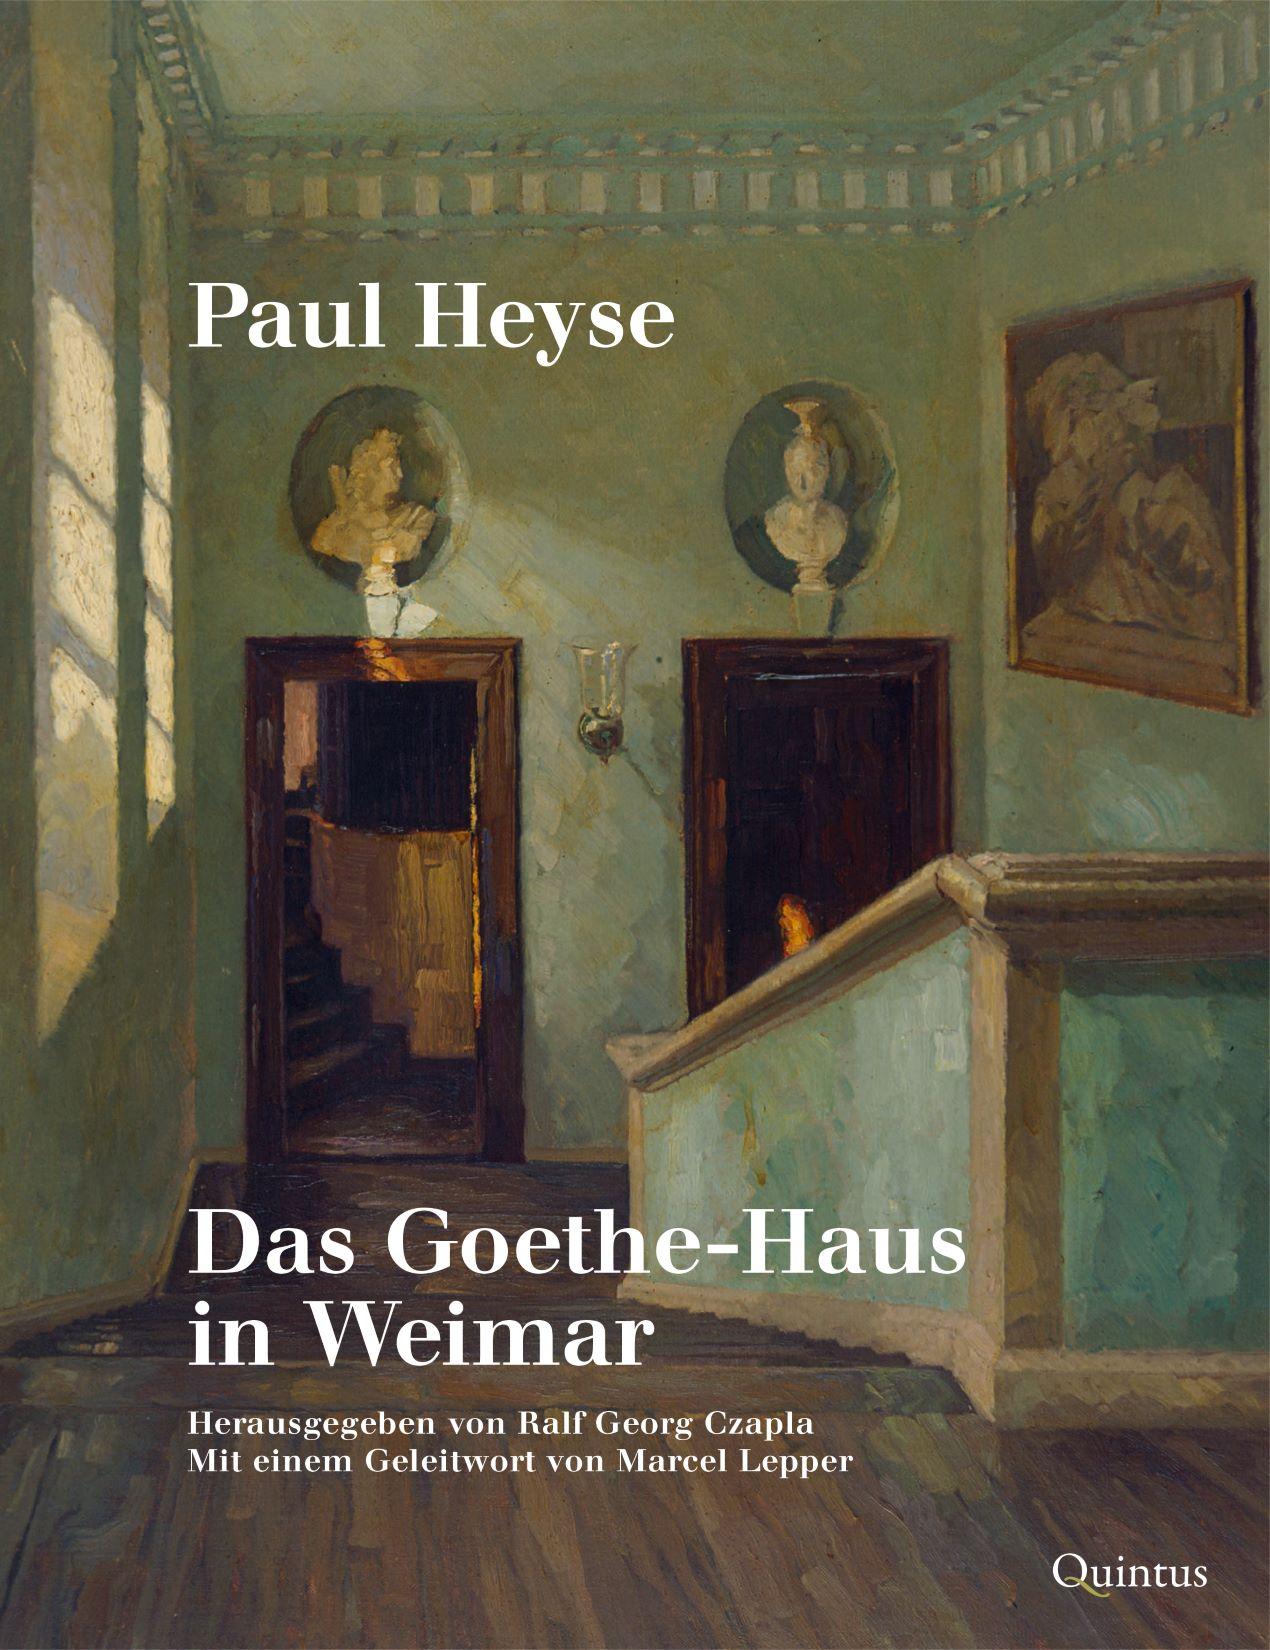 Paul Heyse: Das Goethe-Haus in Weimar